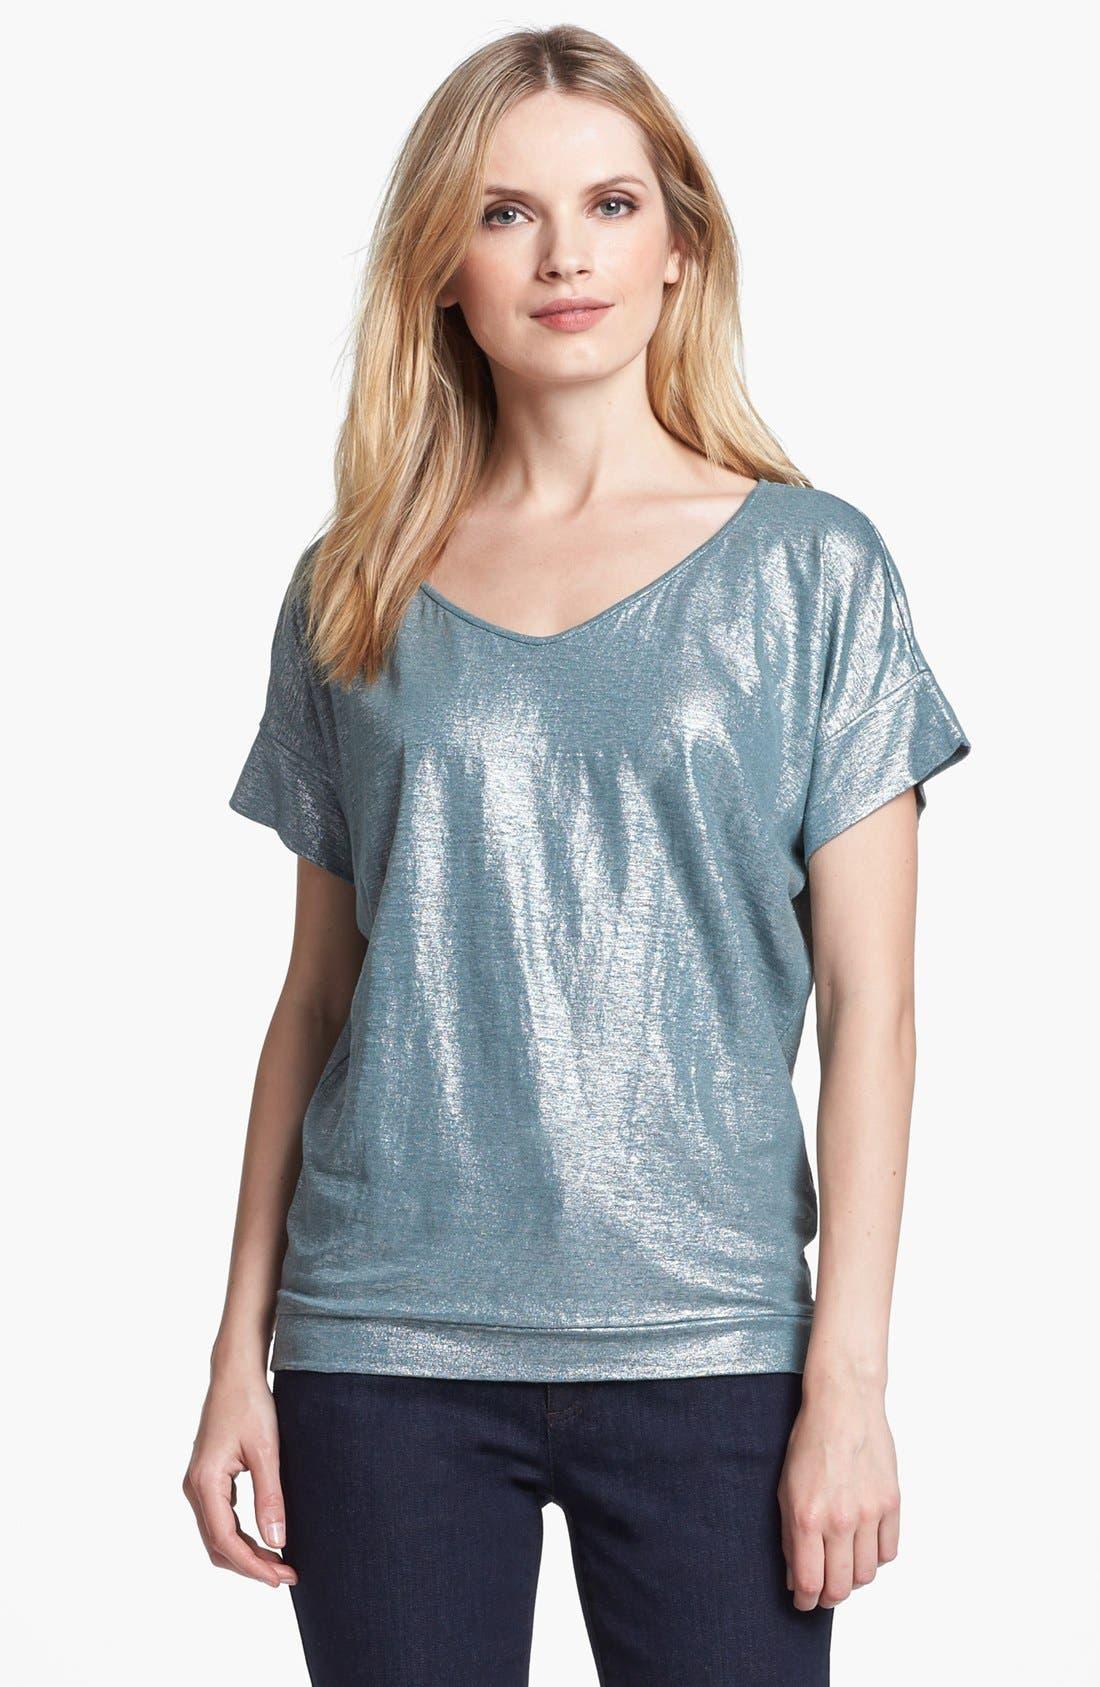 Alternate Image 1 Selected - Eileen Fisher Metallic Knit Wedge Top